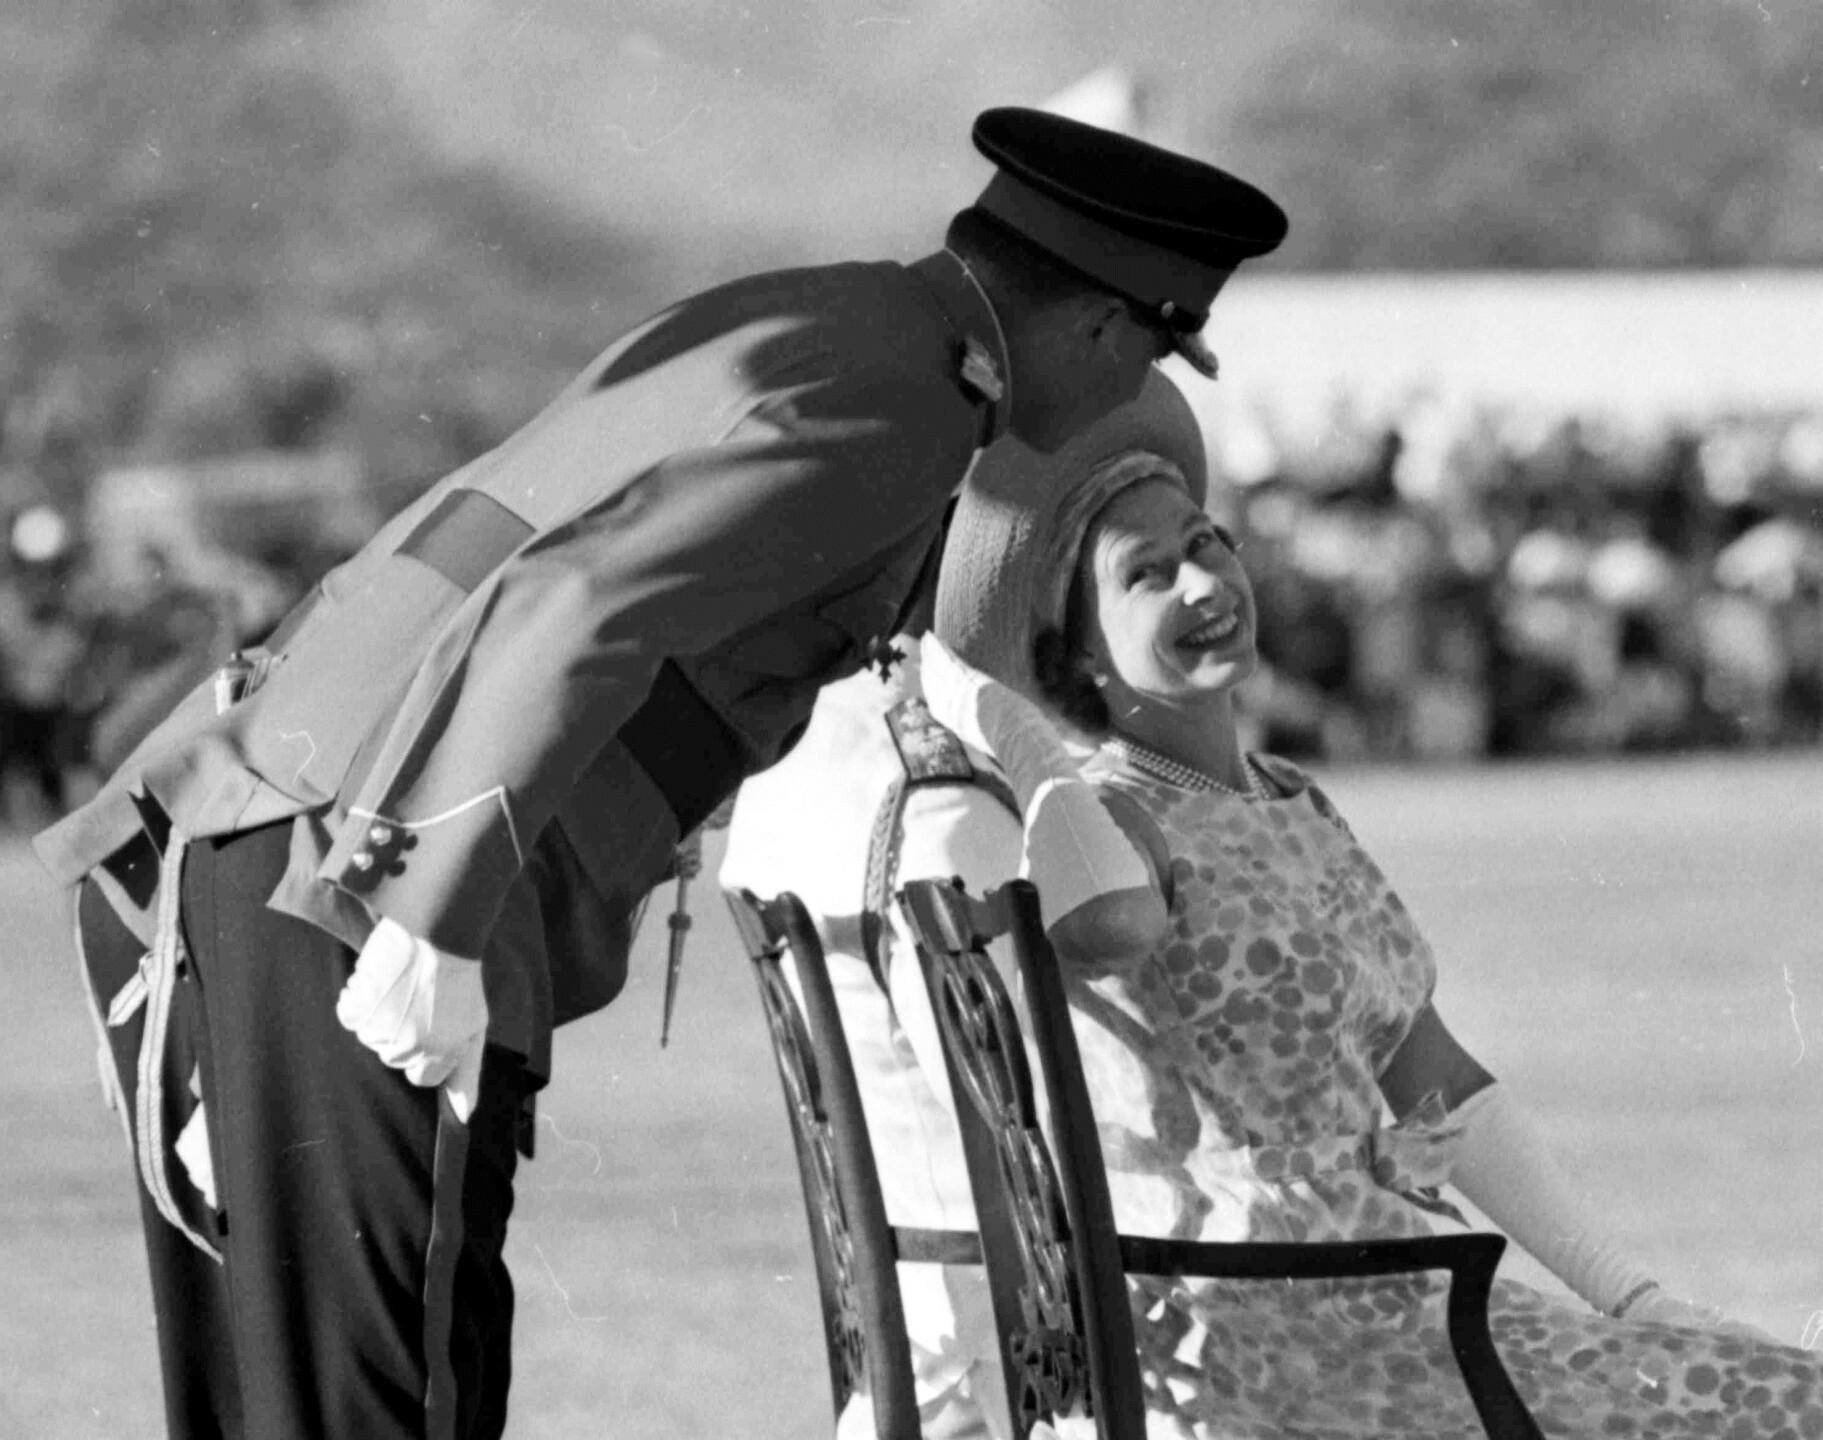 Britain Queen's Reign Photo Gallery